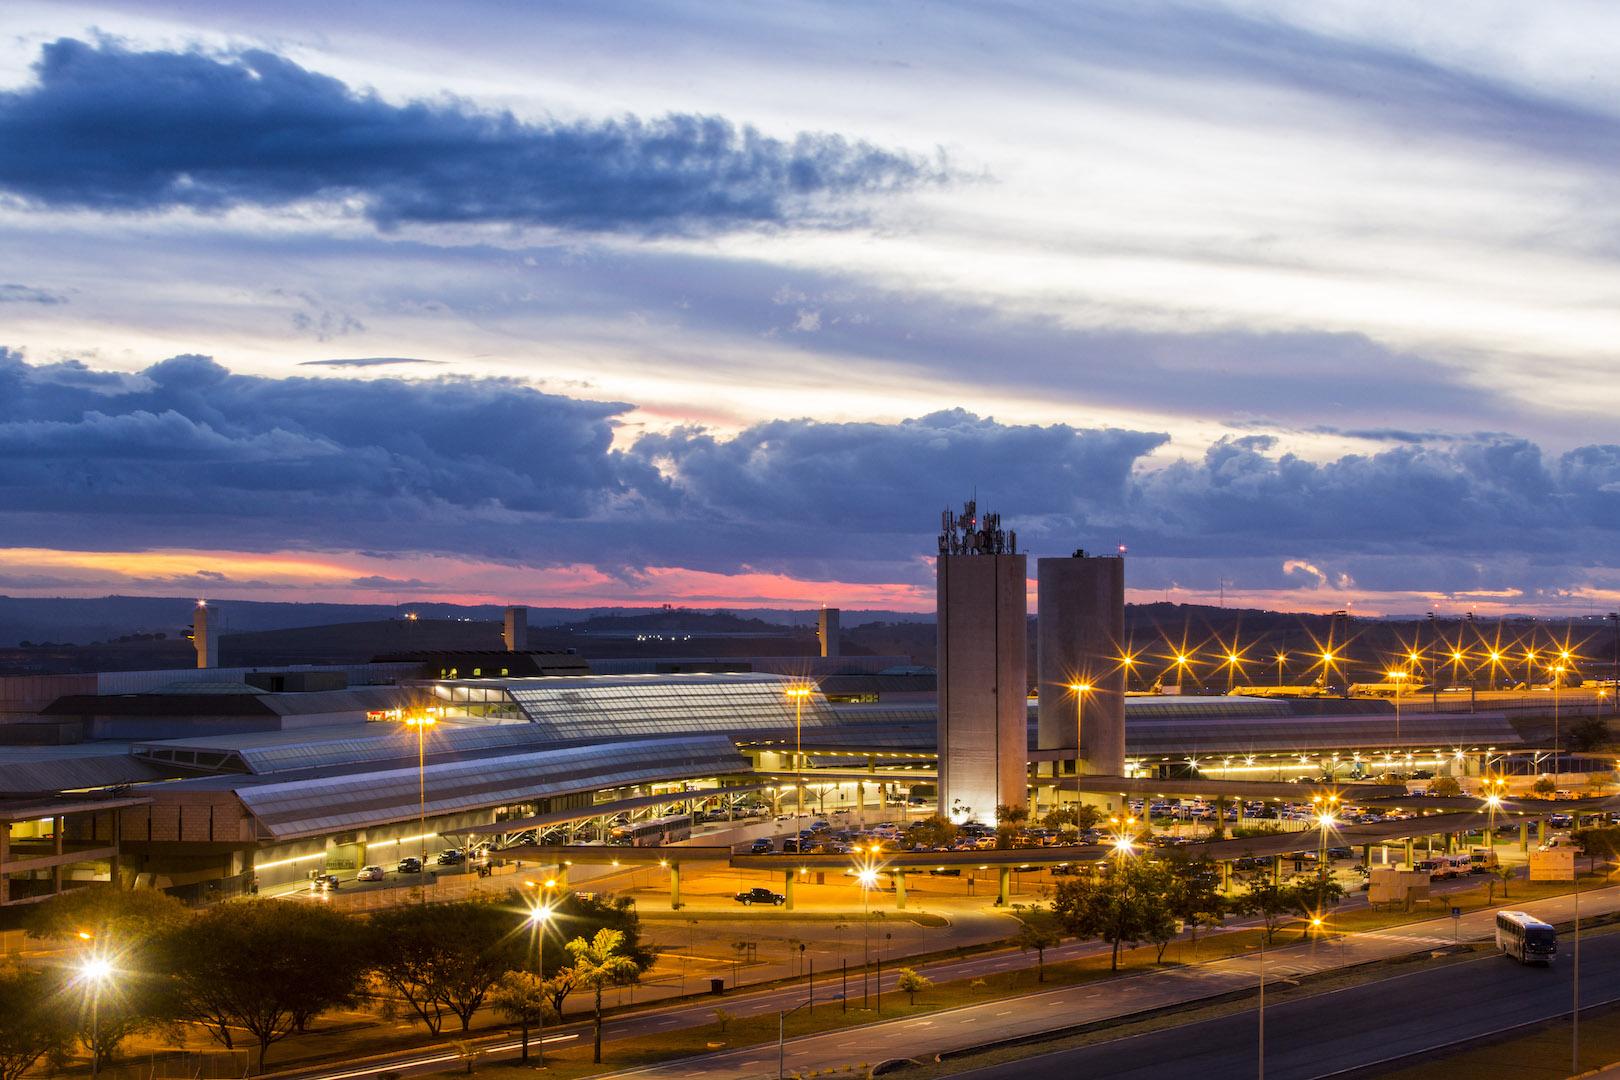 BH Airport inaugura unidade para exames RT-PCR da covid-19